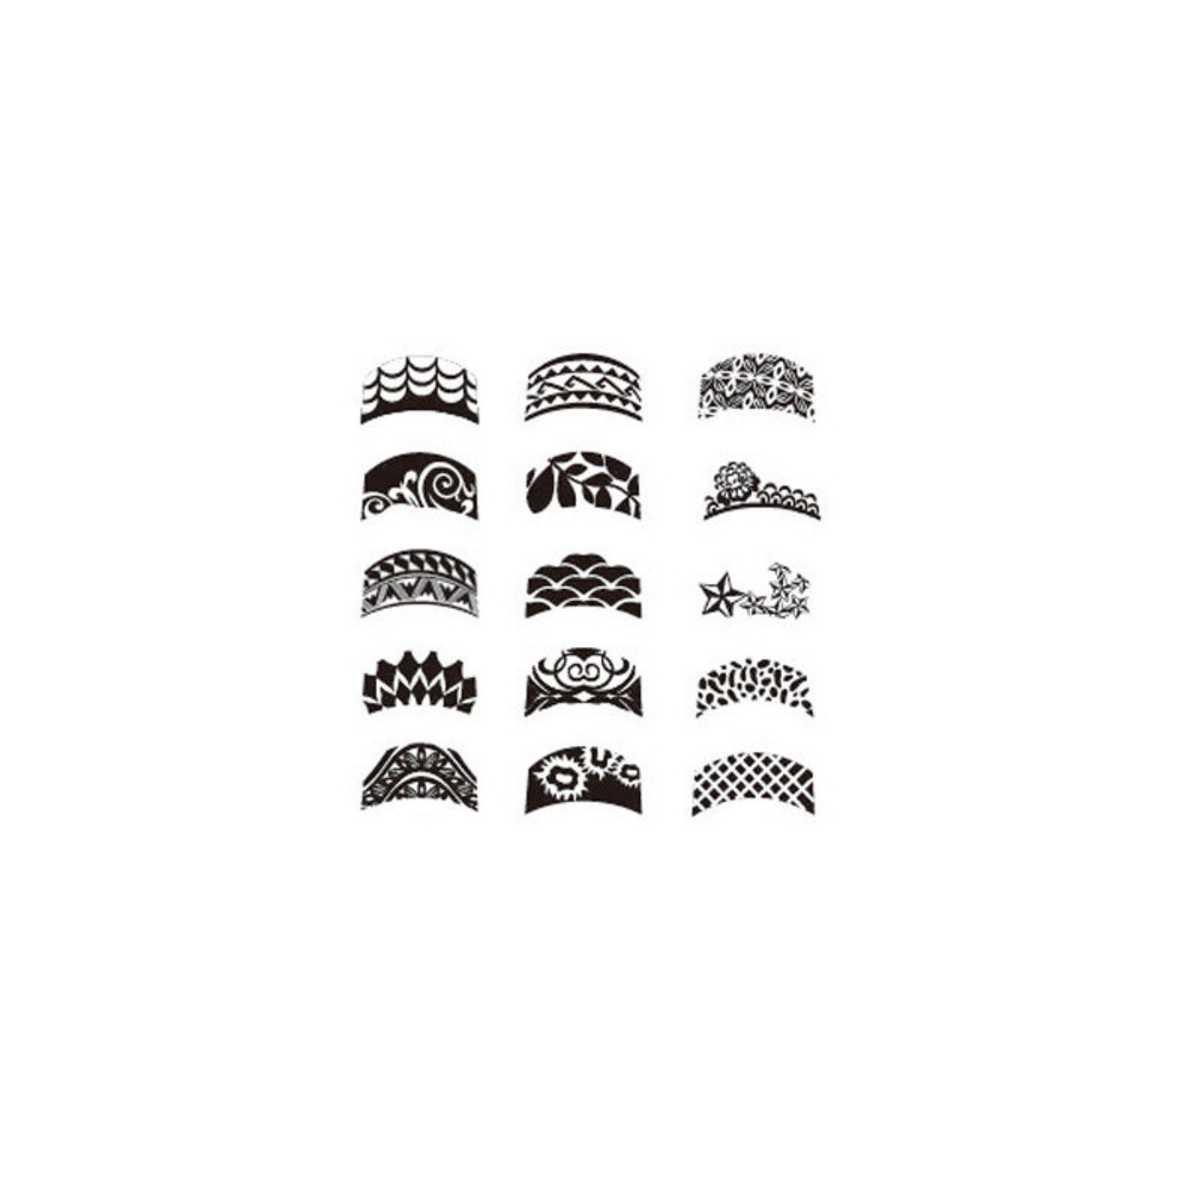 Plaque de stamping french quadrillage dentelle dessin azt que - Dessin azteque ...